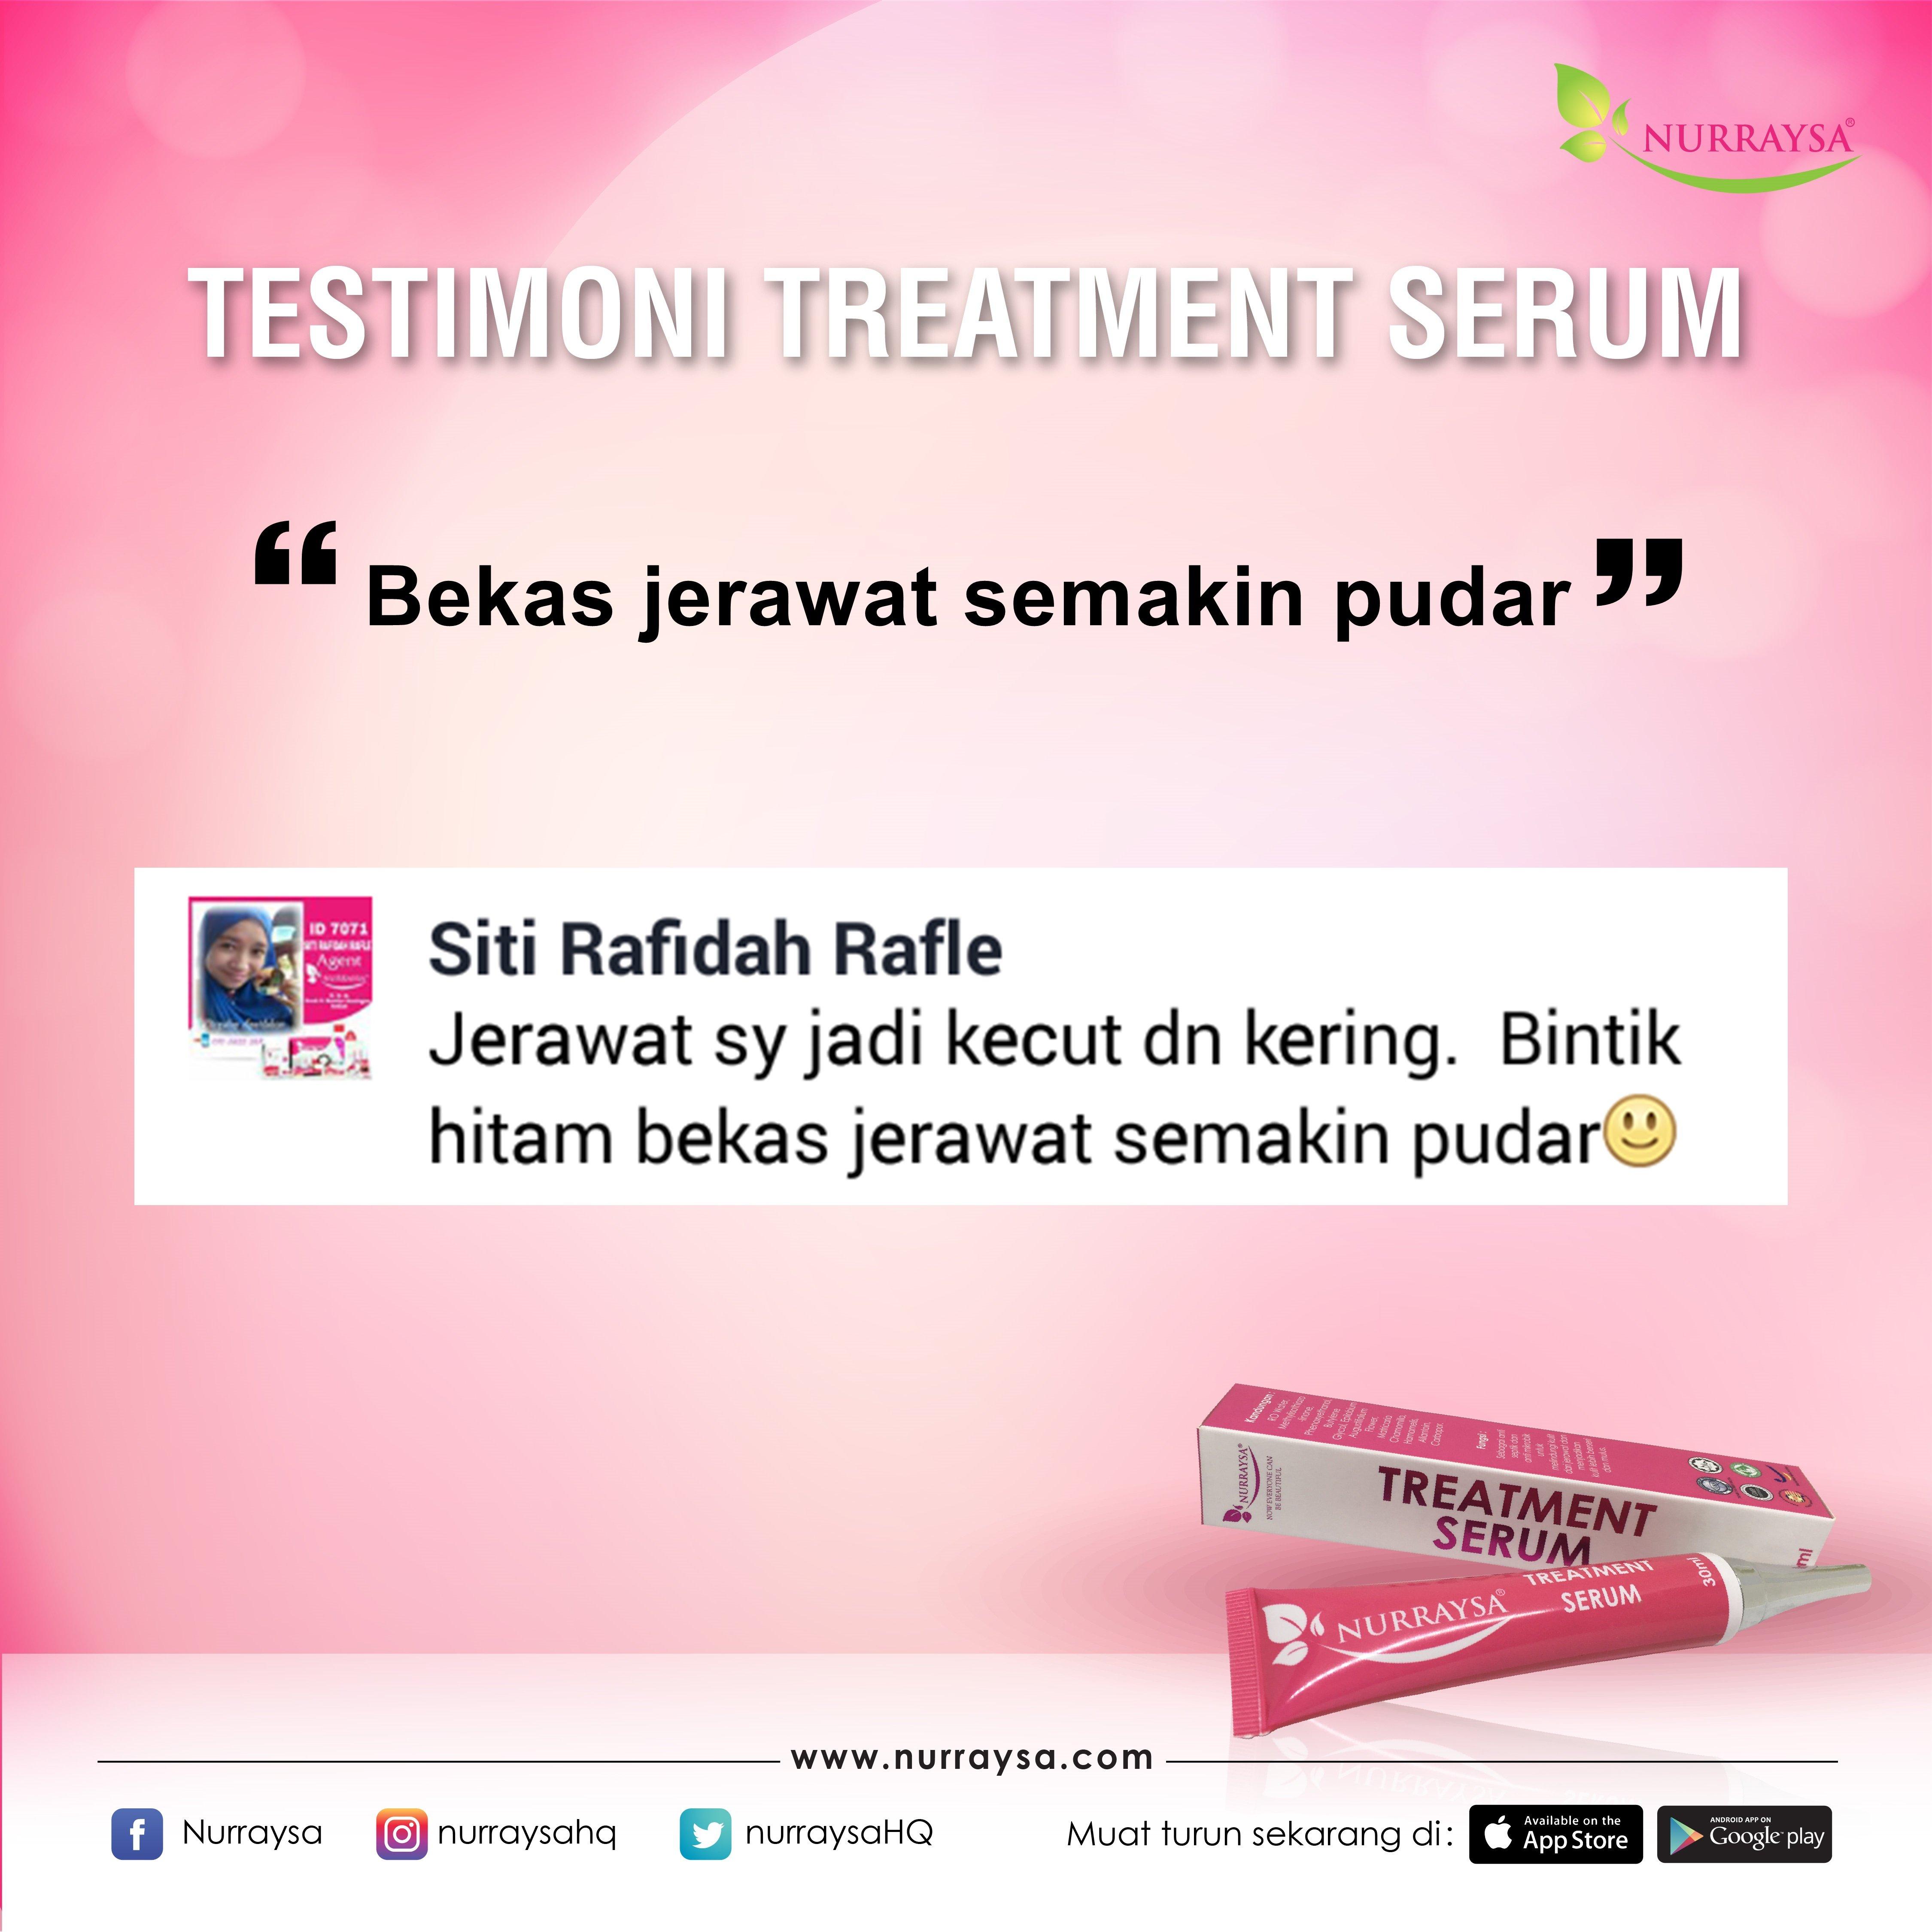 Testimoni Treatment Serum 4